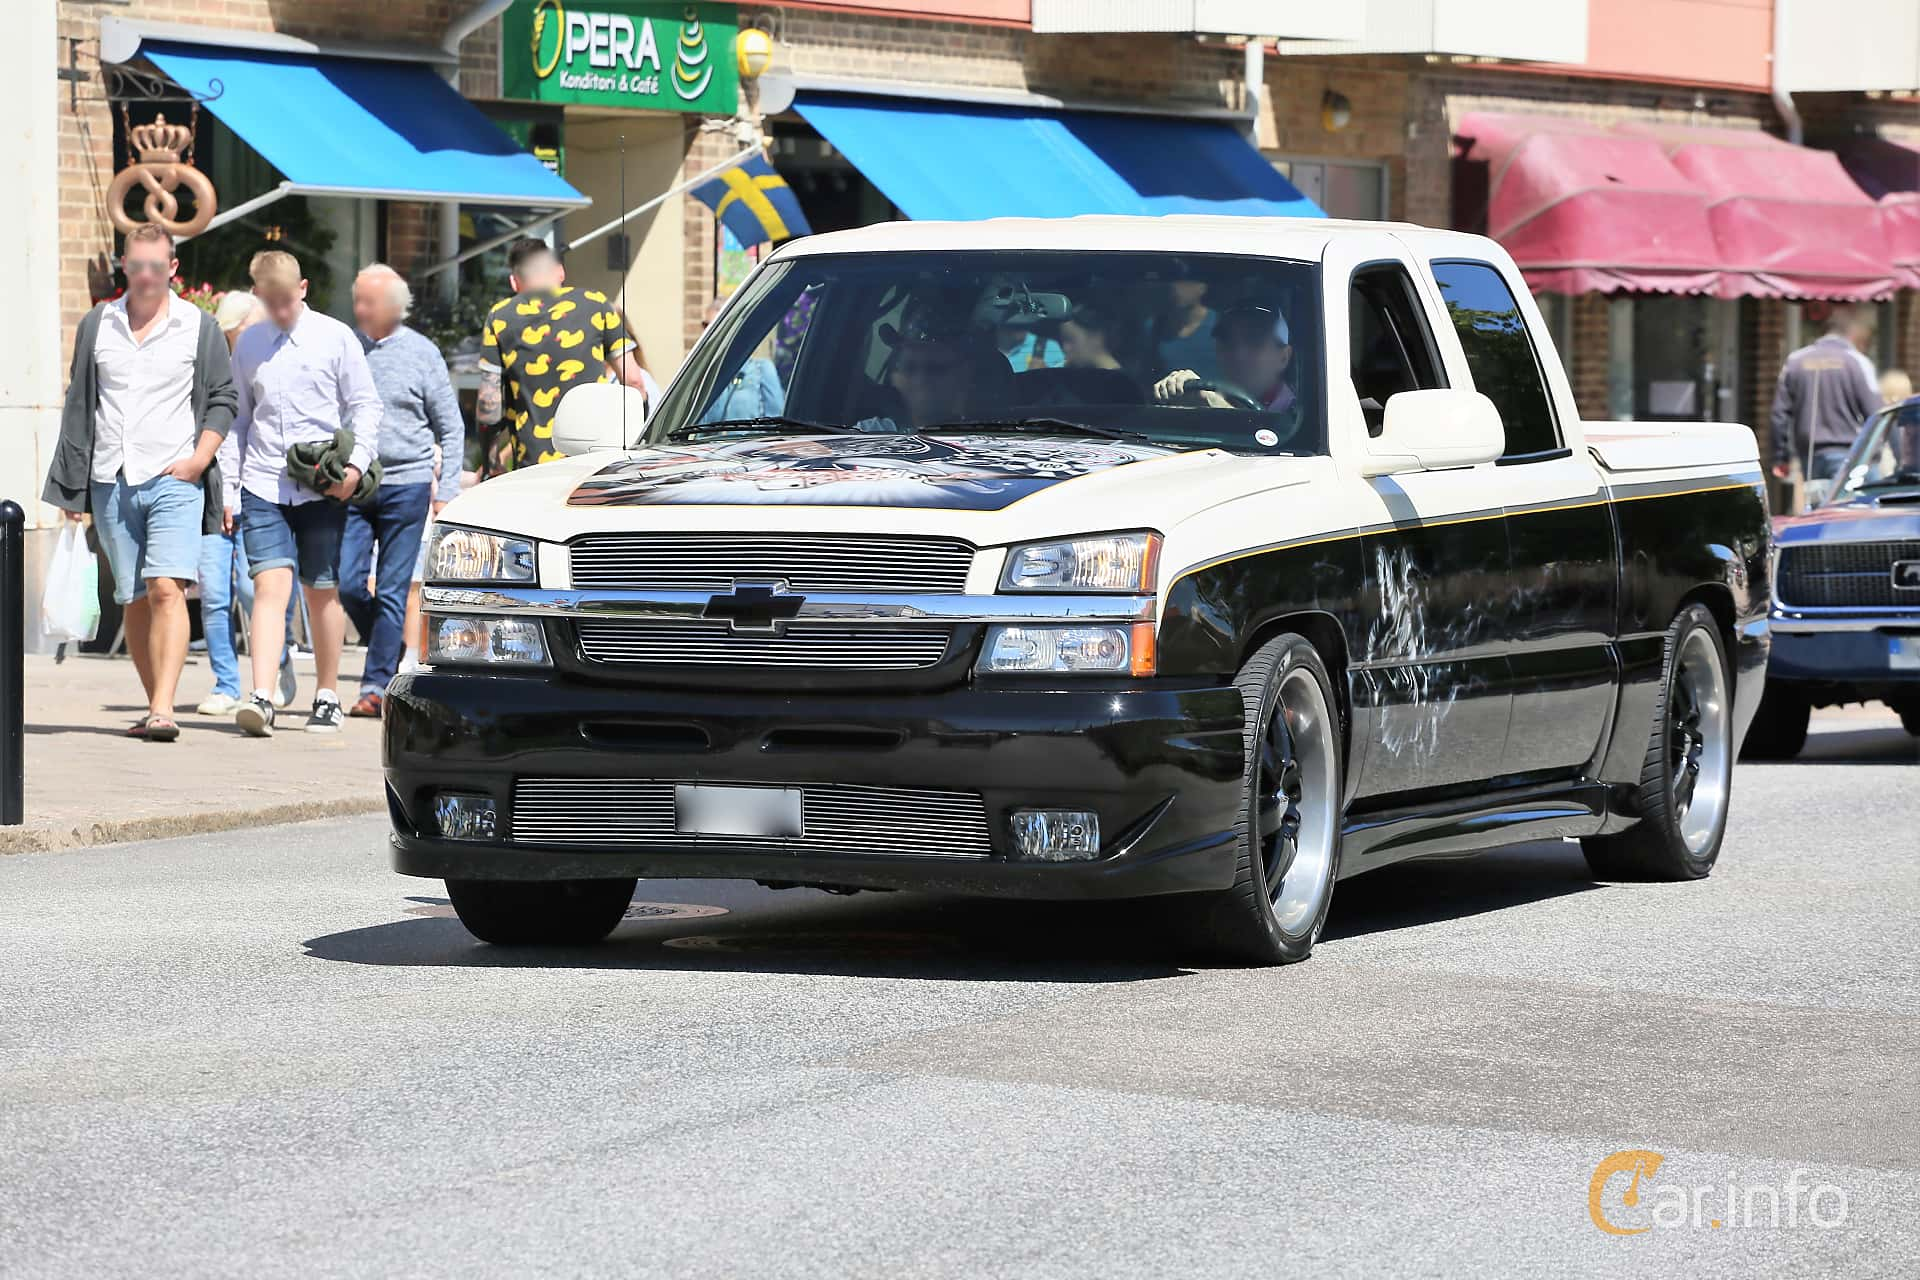 Chevrolet Silverado 1500 Crew Cab 5.3 V8 Hydra-Matic, 299hp, 2005 at Cruising Lysekil 2019